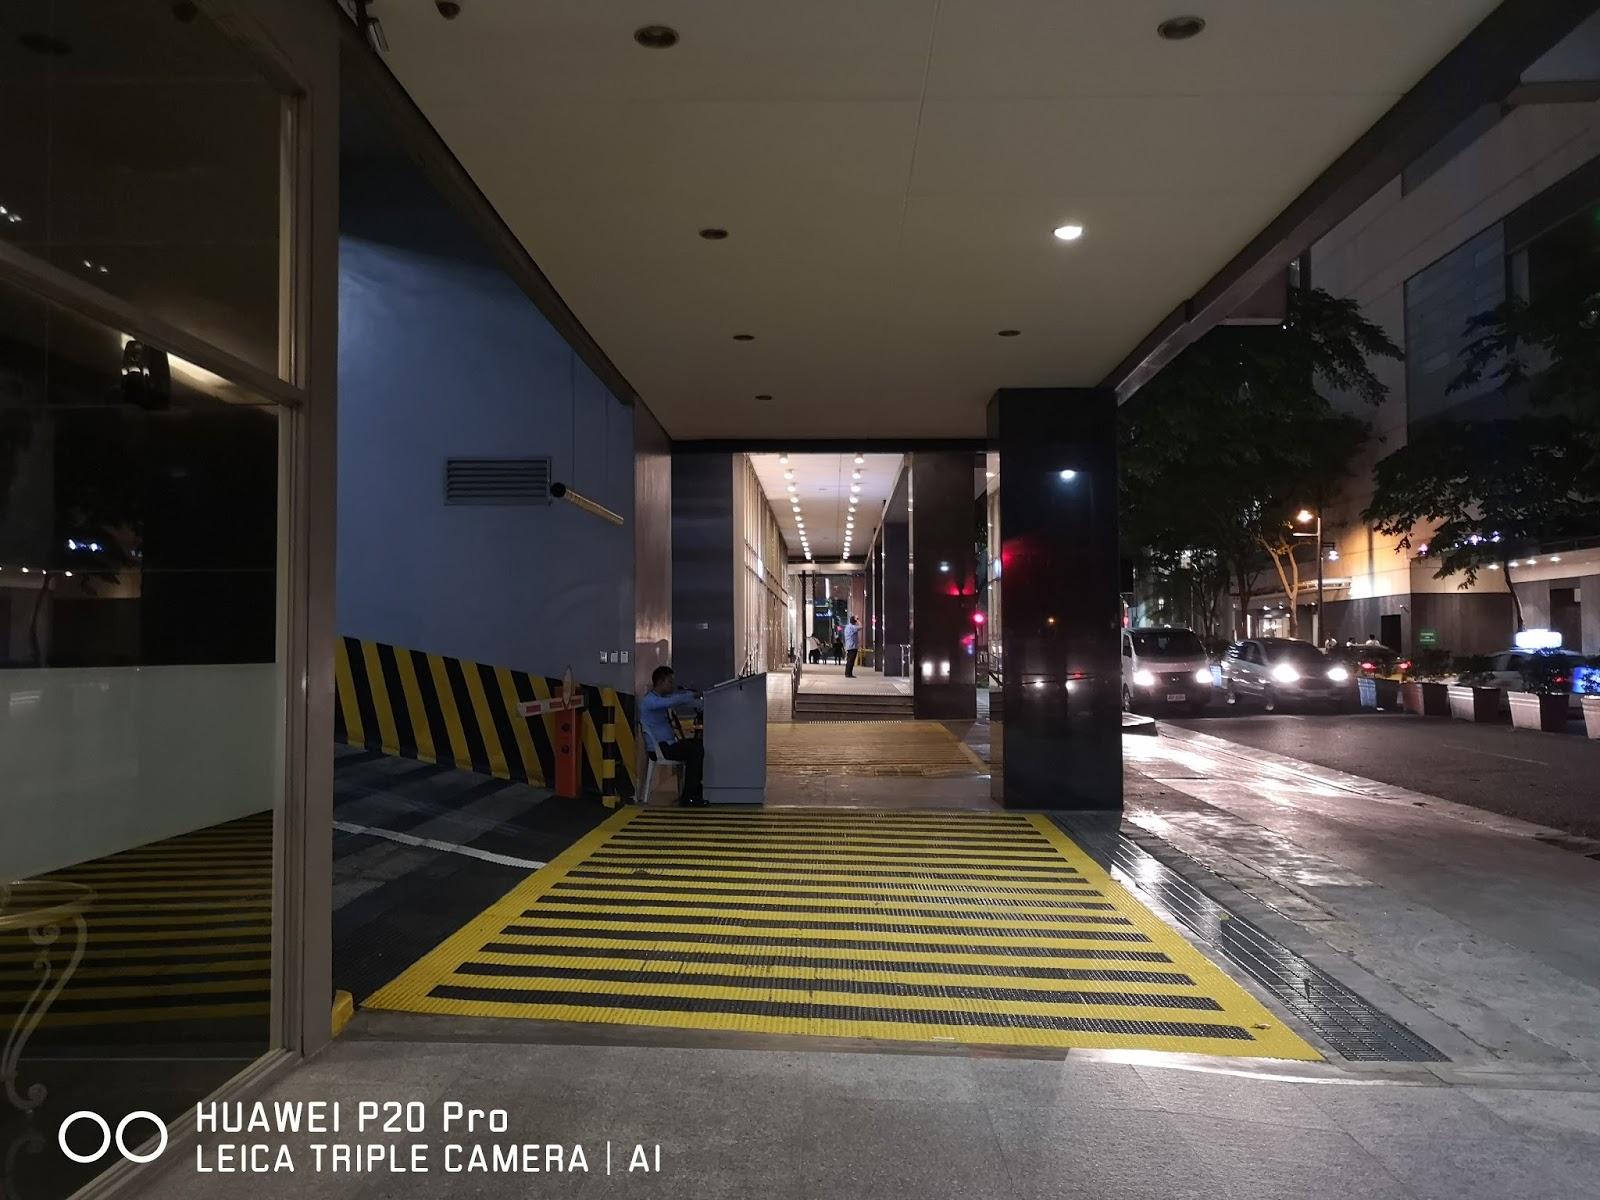 Huawei P20 Pro Low Light Camera Shot